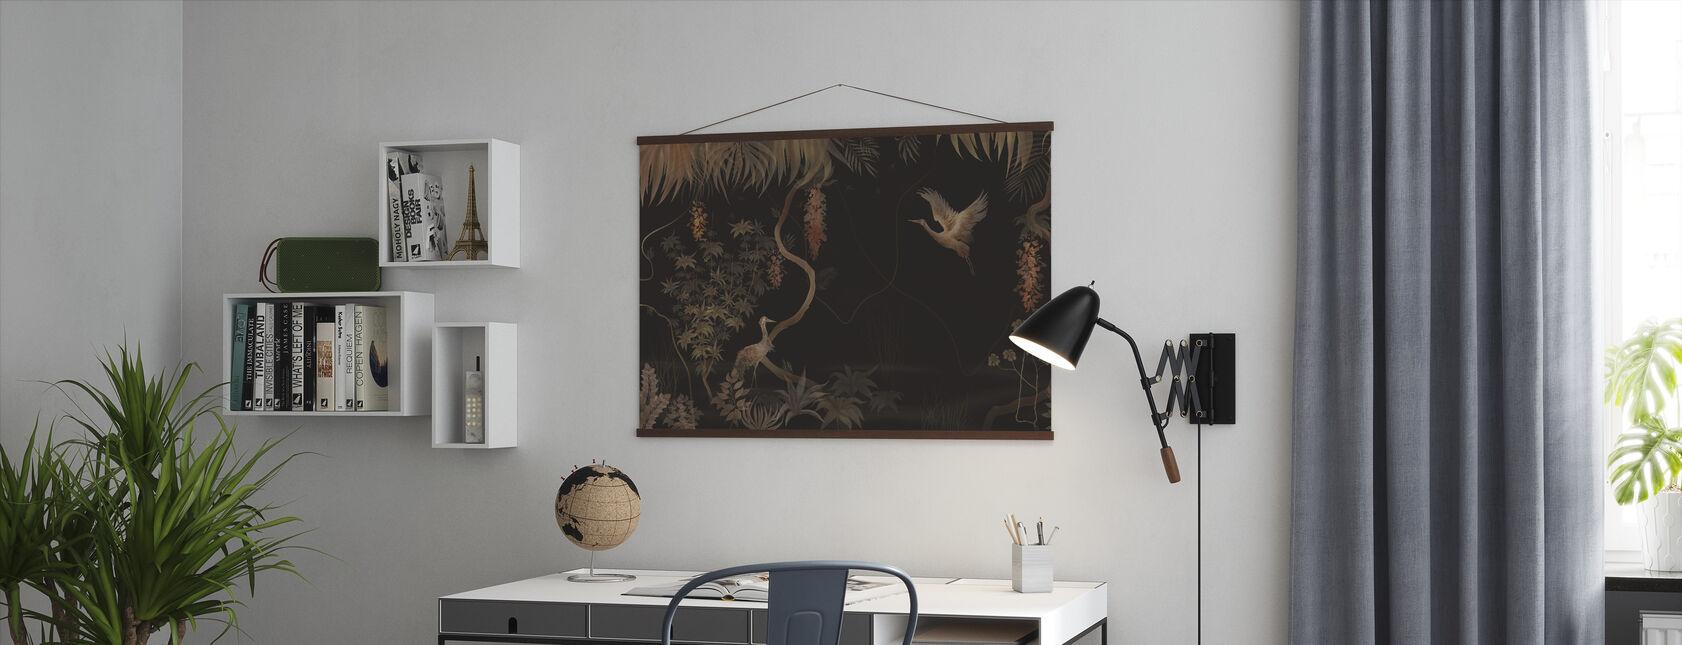 Lugnt landskap - mörk hassel - Poster - Kontor